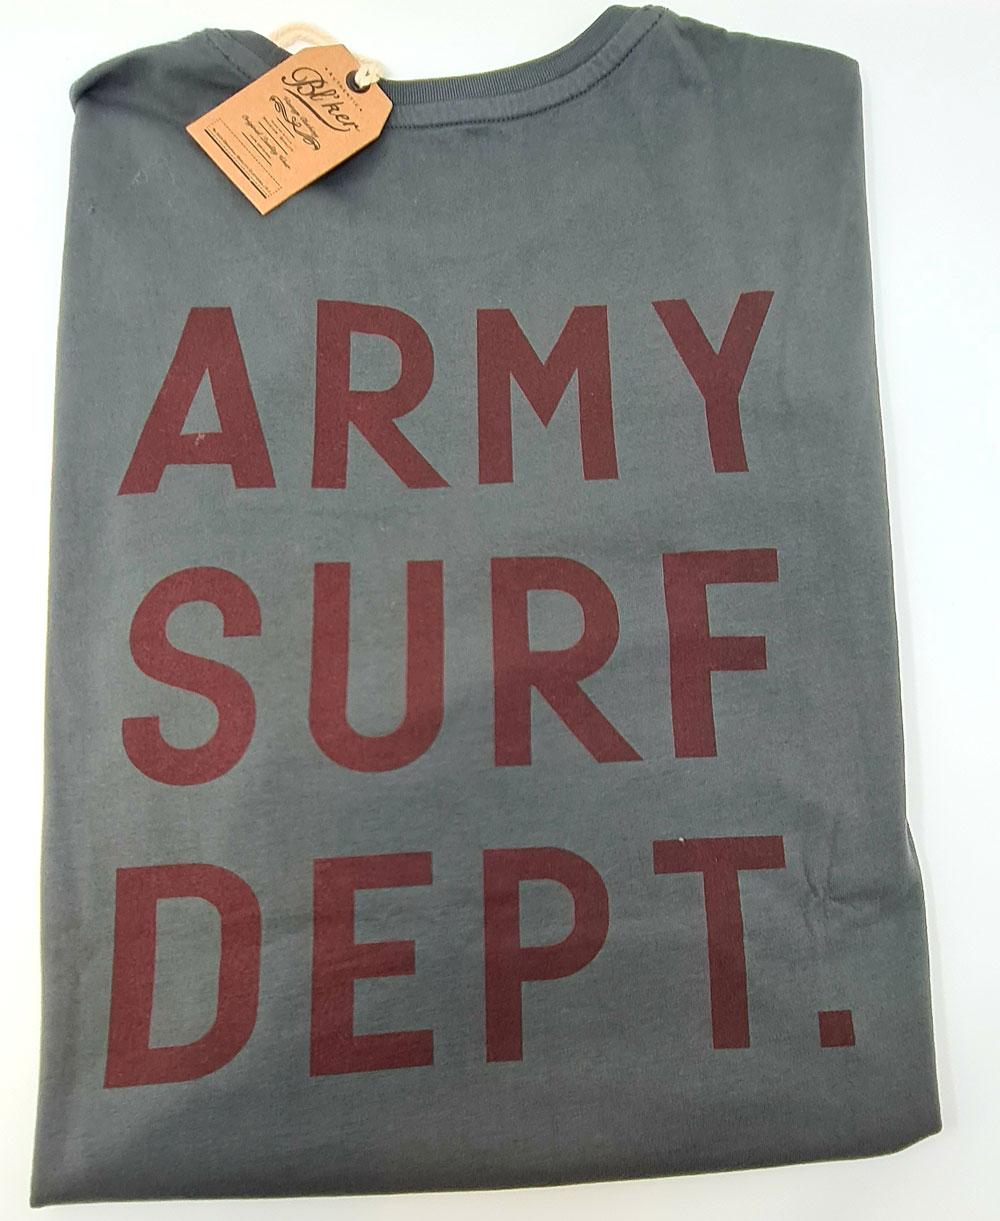 Men's Short Sleeve T-Shirt Army Surf Dept Faded Black